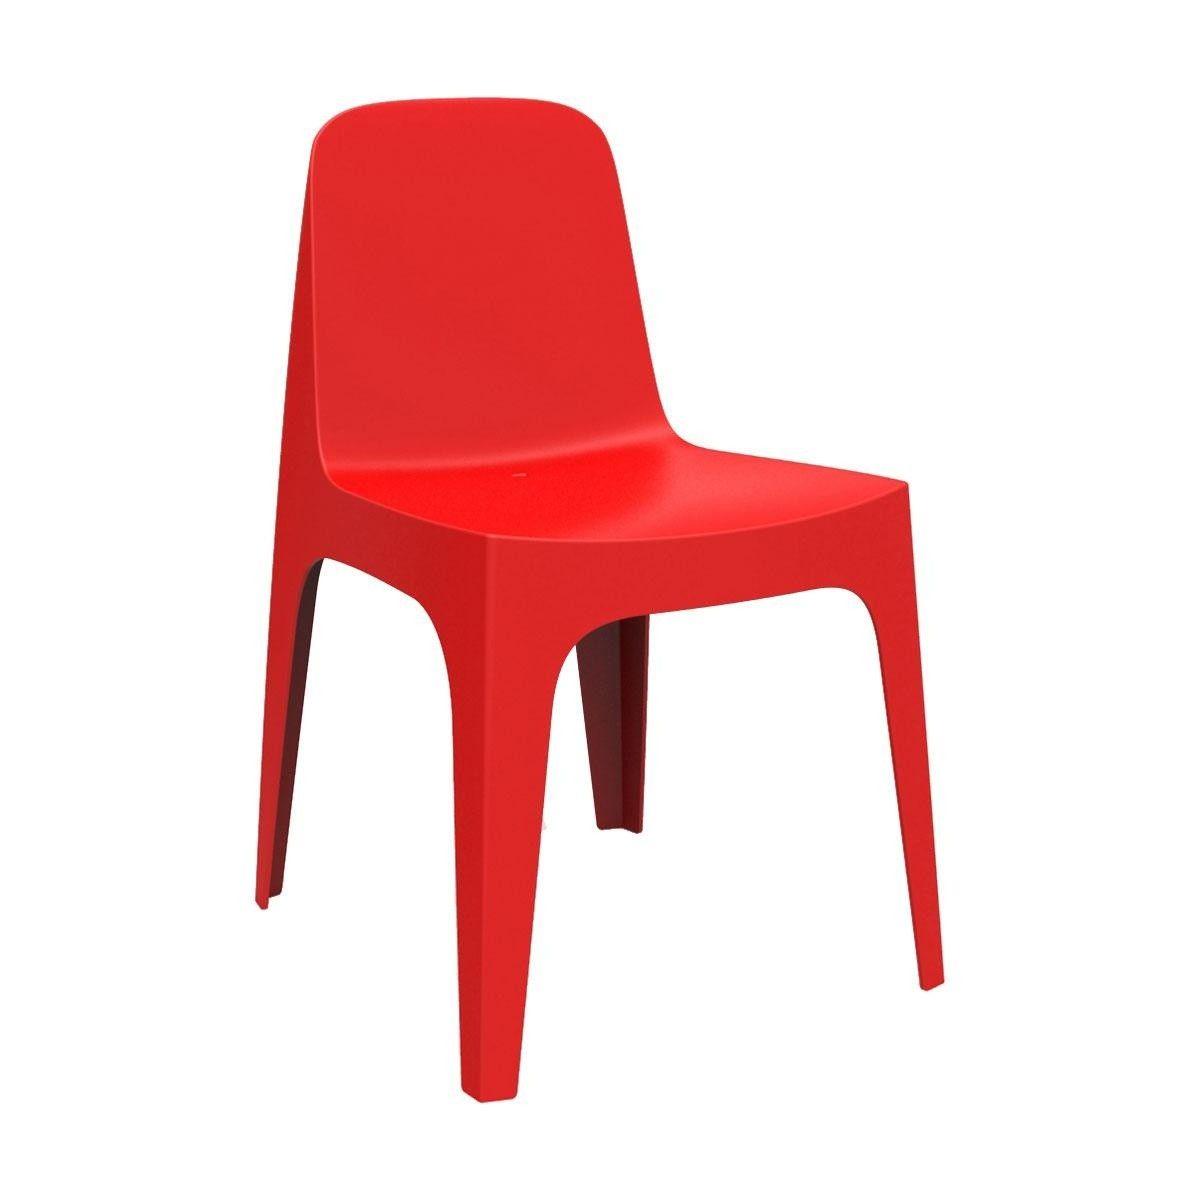 solid chair vondom. Black Bedroom Furniture Sets. Home Design Ideas